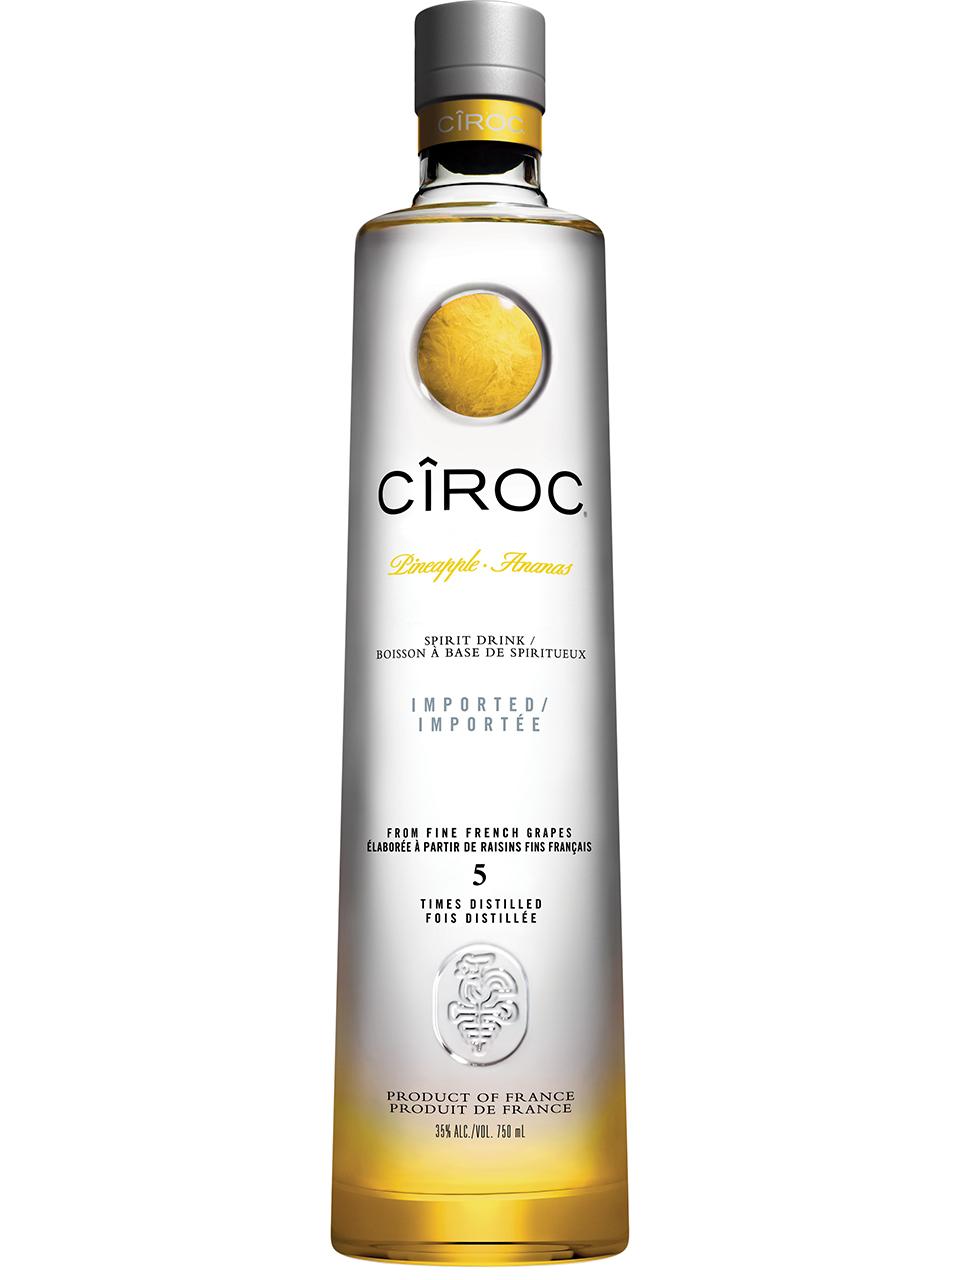 CIROC Pineapple Vodka